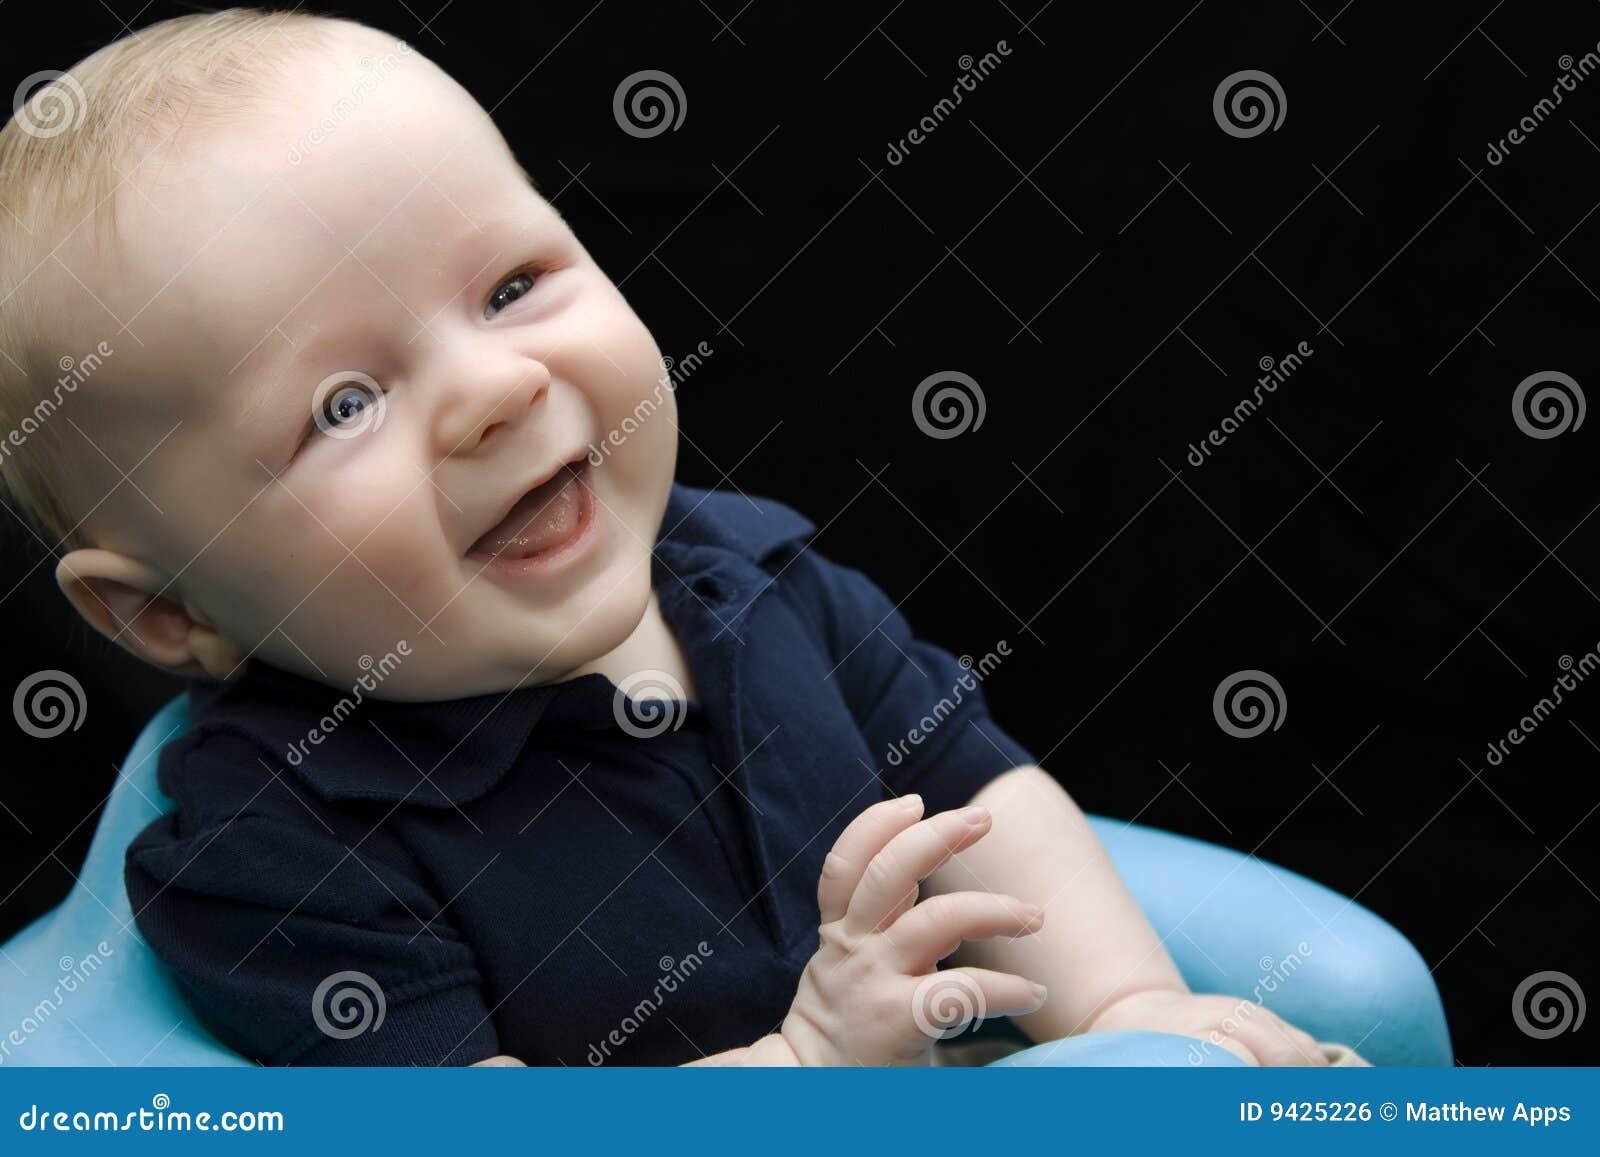 Risa linda del bebé